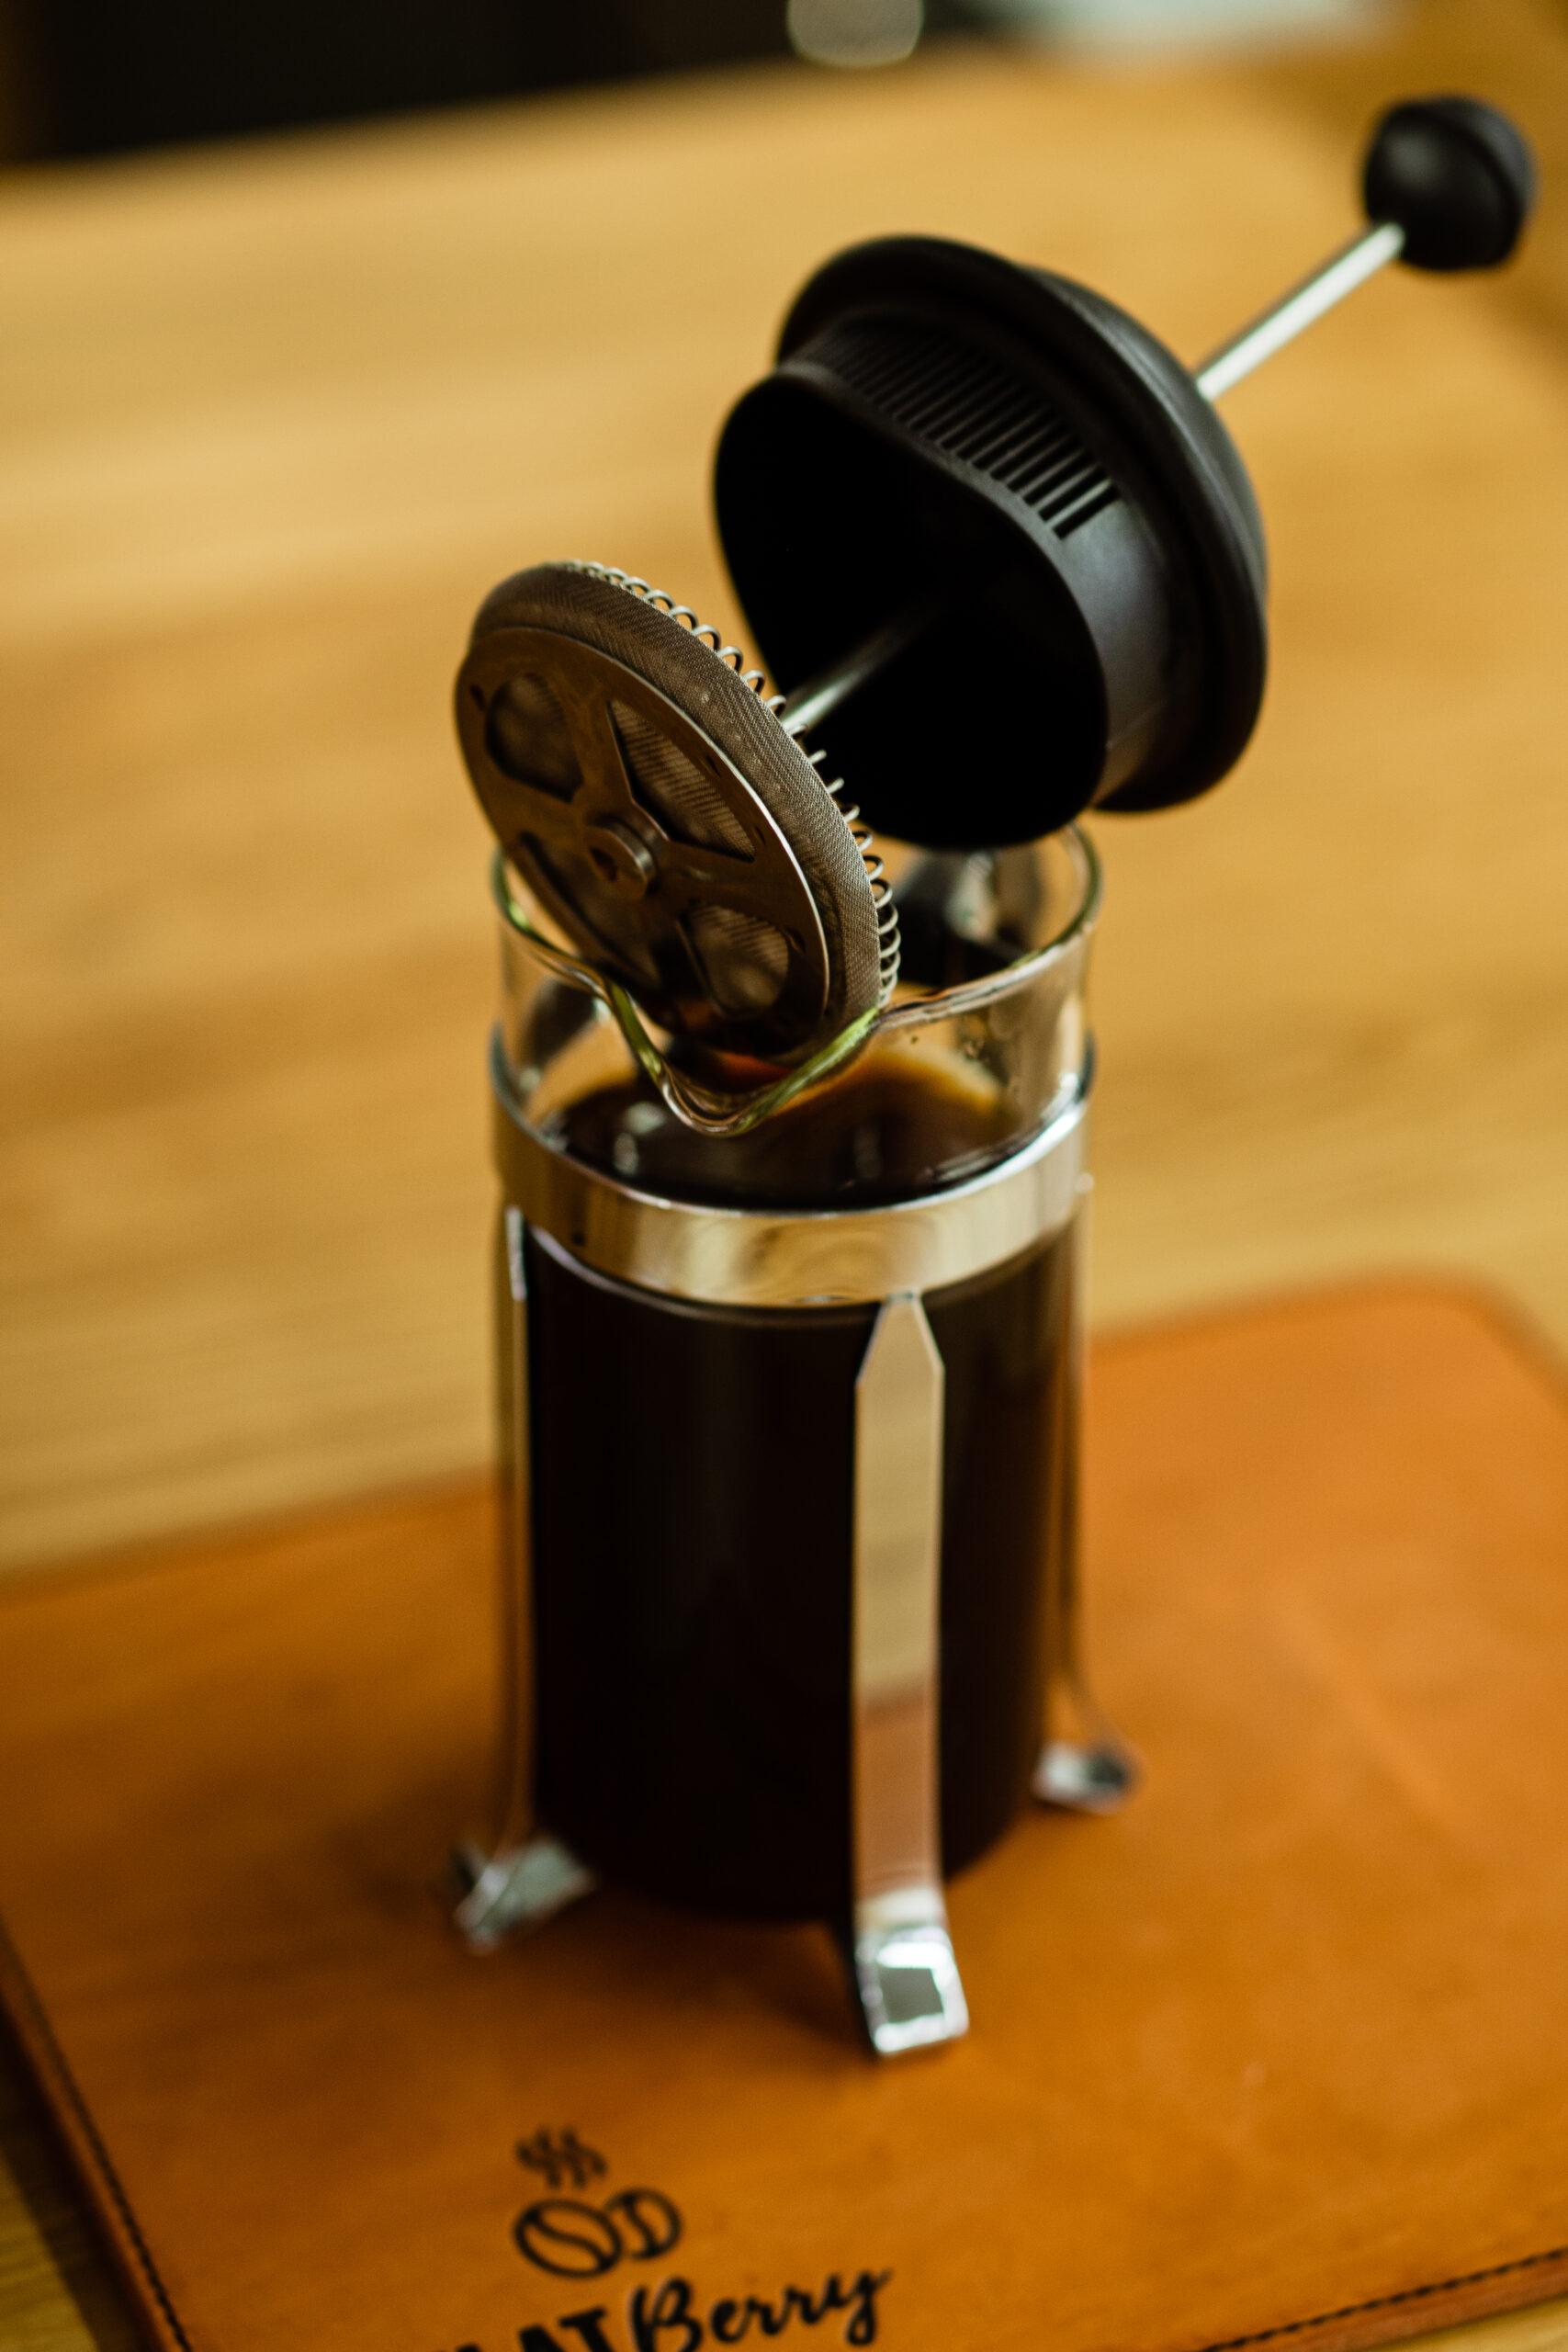 Pressstempelkanne Stempelpresskanne Bodum